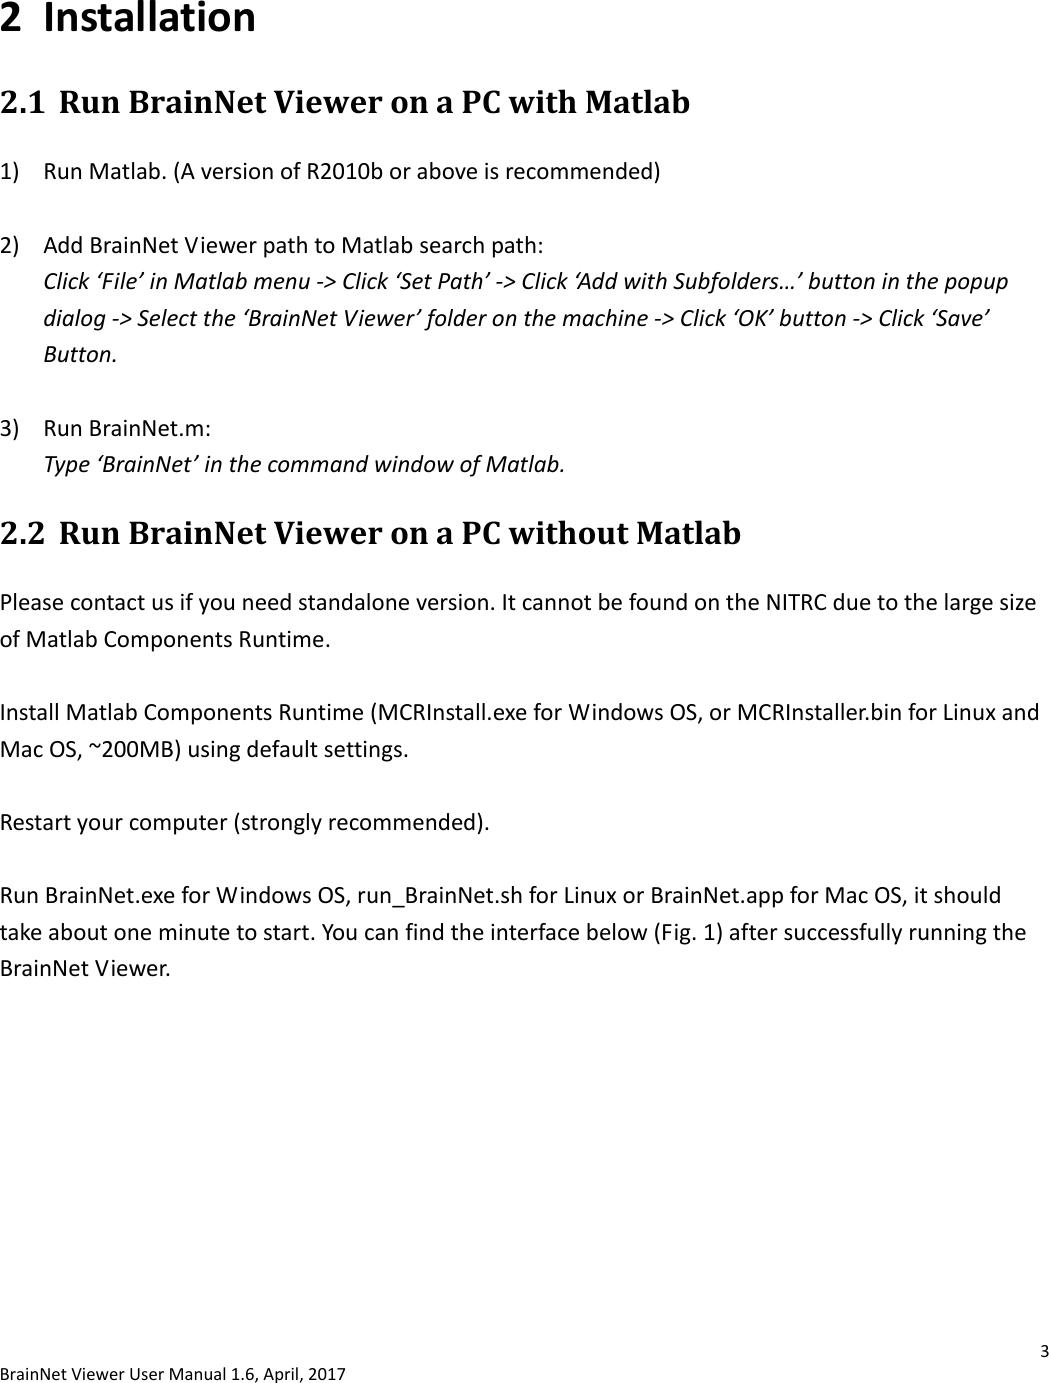 BrainNet Viewer Manual Brain Net